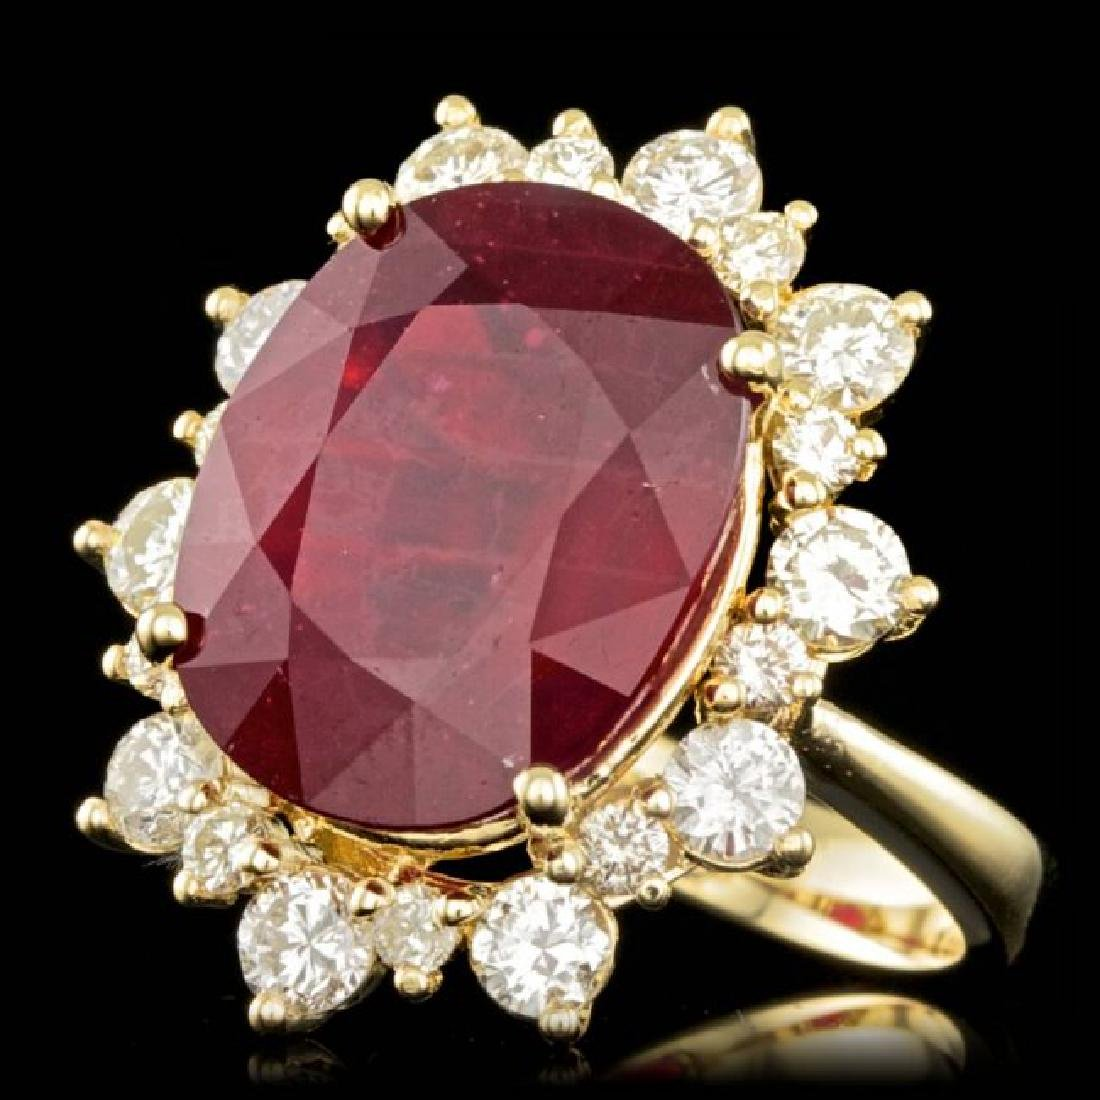 14k Yellow Gold 13.00ct Ruby 1.80ct Diamond Ring - 2